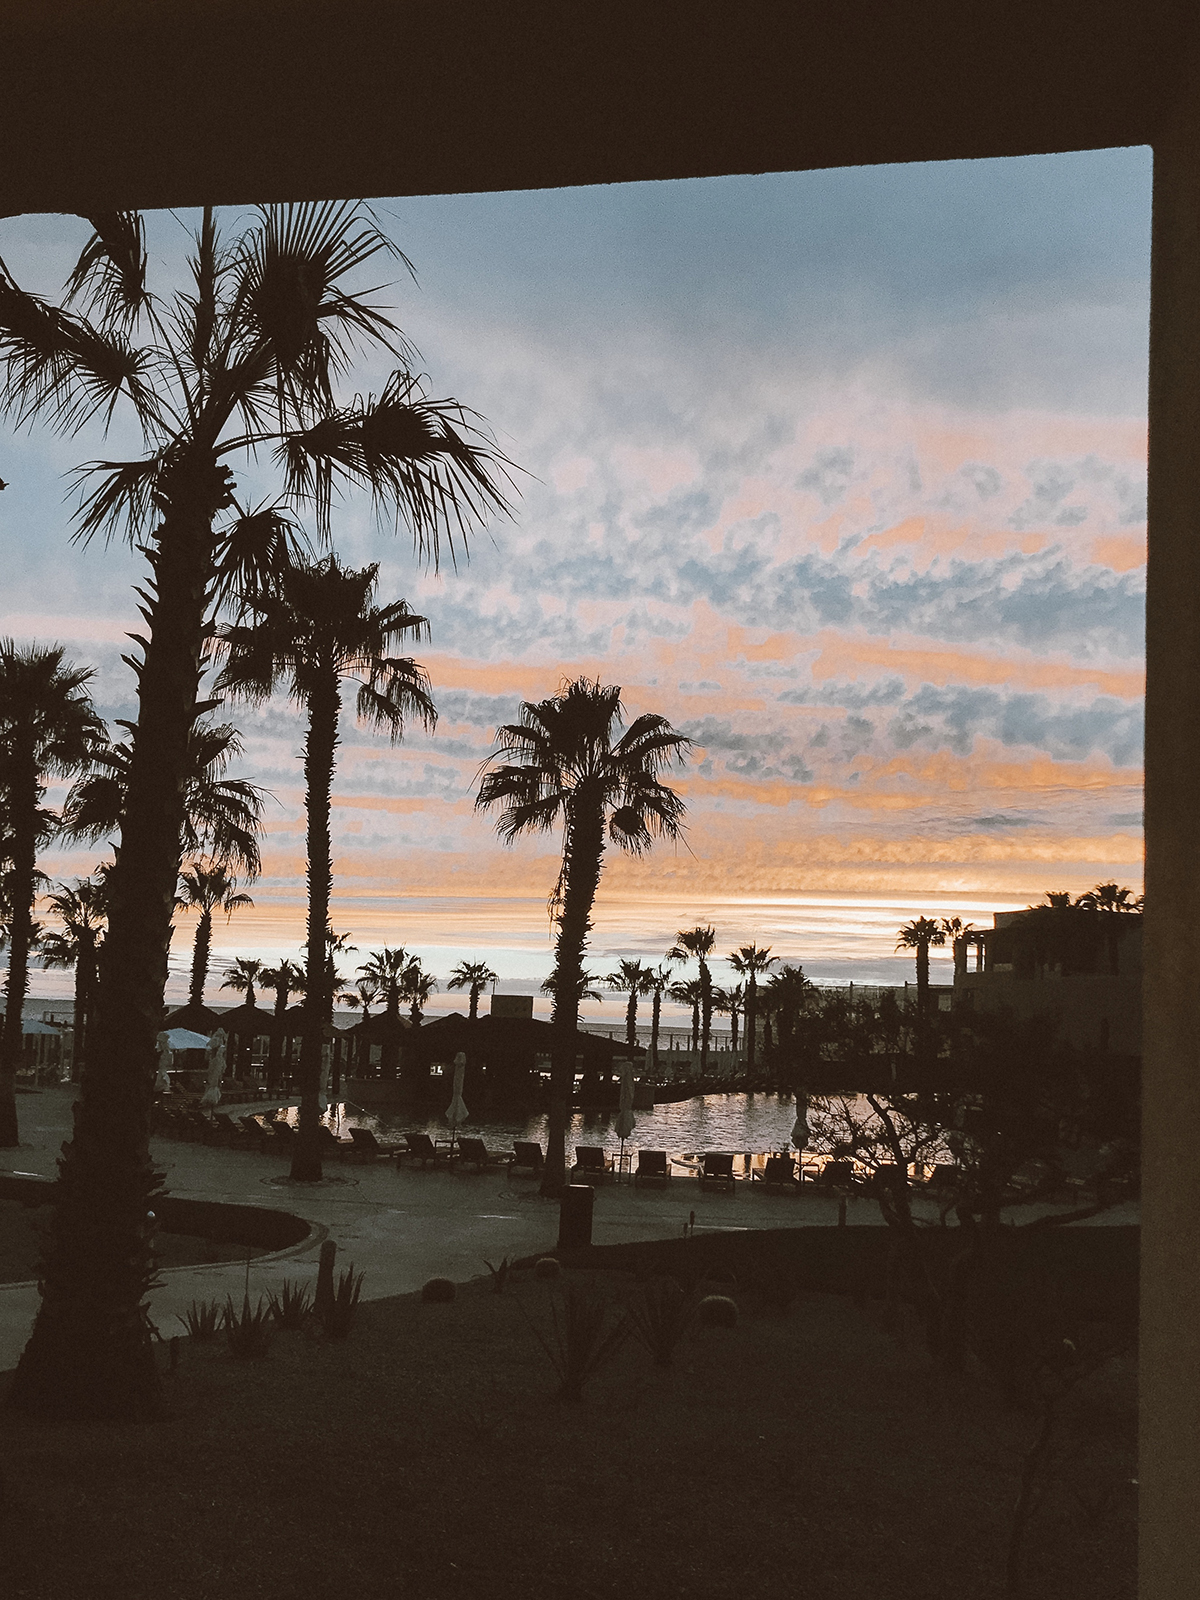 the prettiest sunset at pueblo bonito pacifica resort!